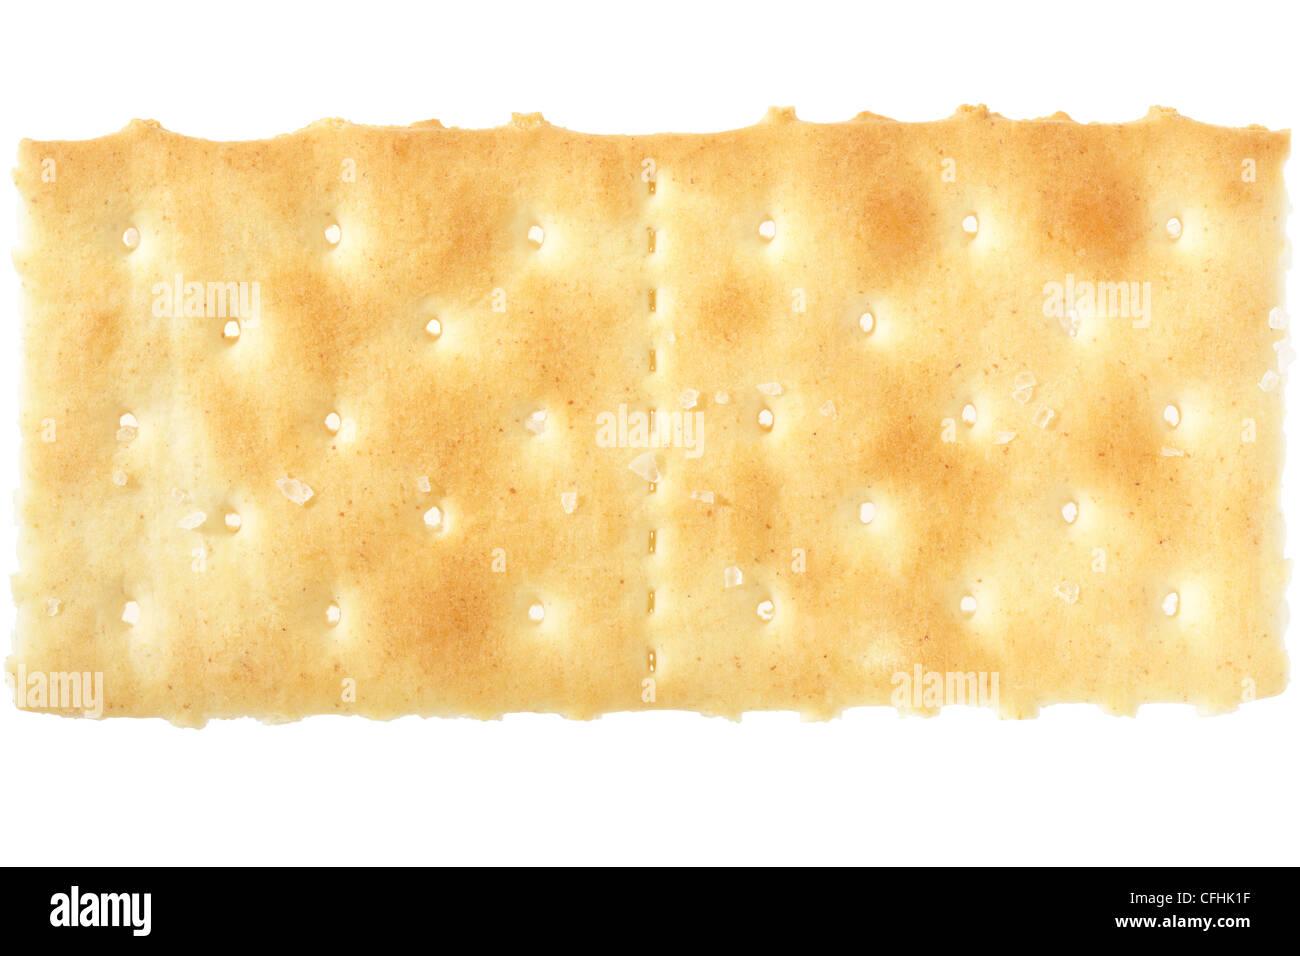 Cracker - Stock Image